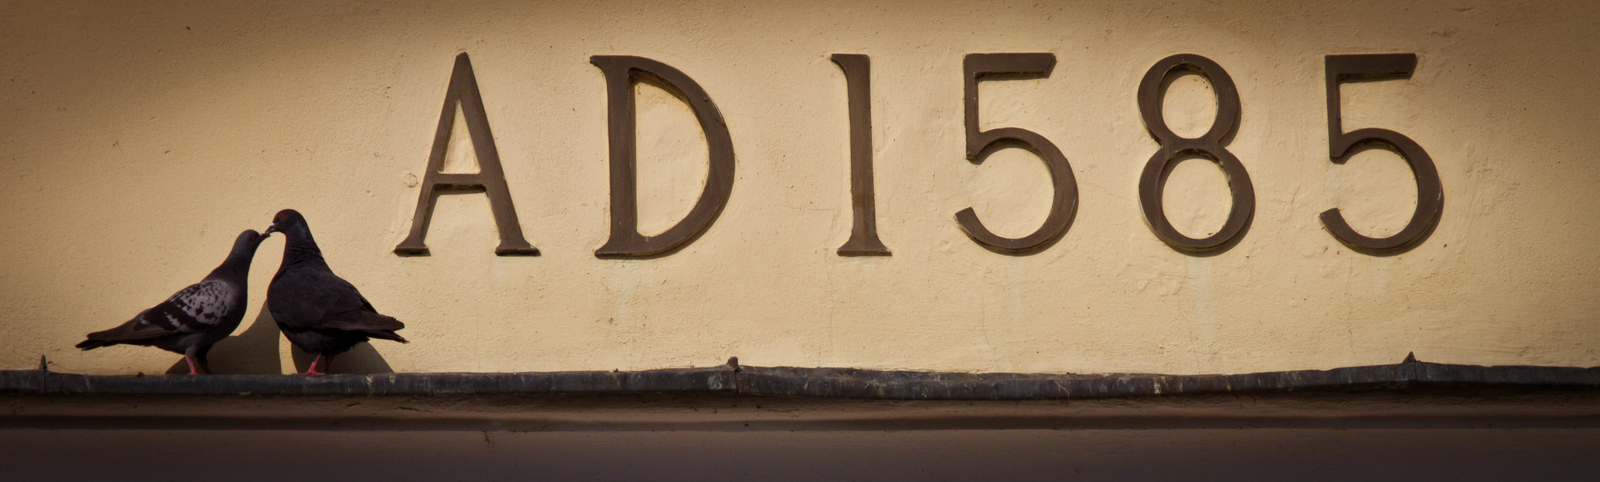 AD1585